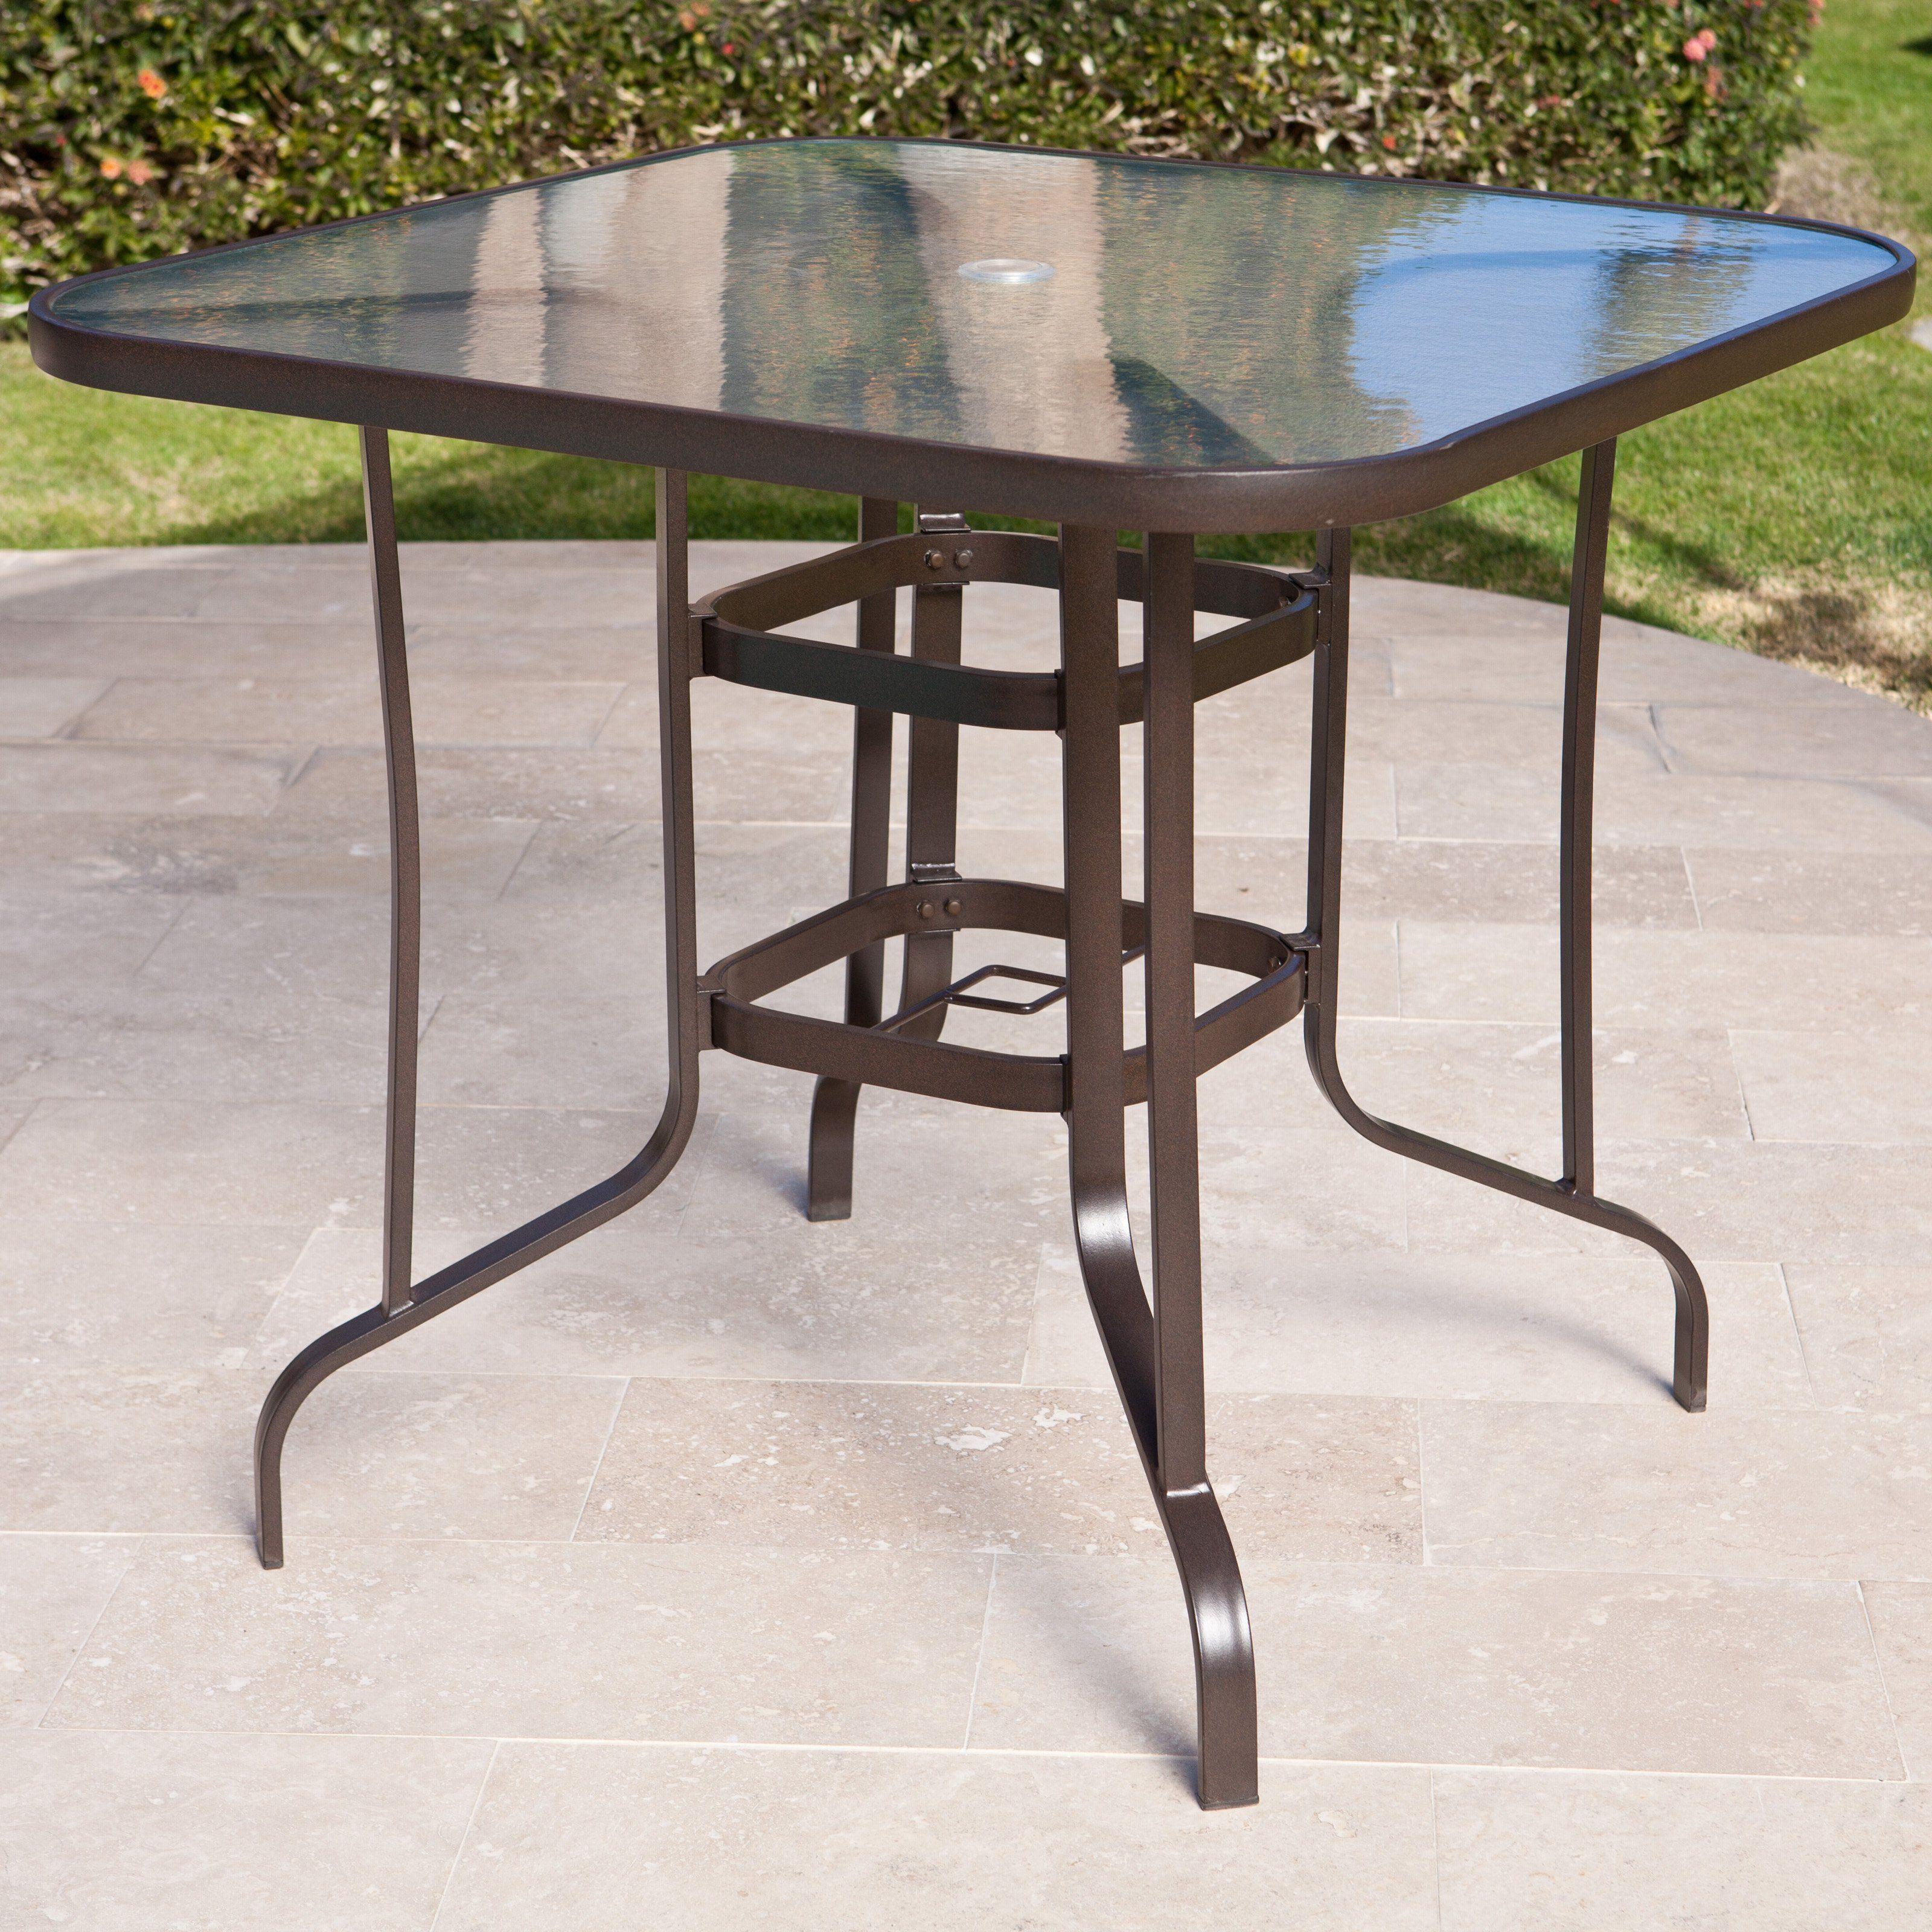 C Coast Del Rey Balcony Height Outdoor Dining Table 219 99